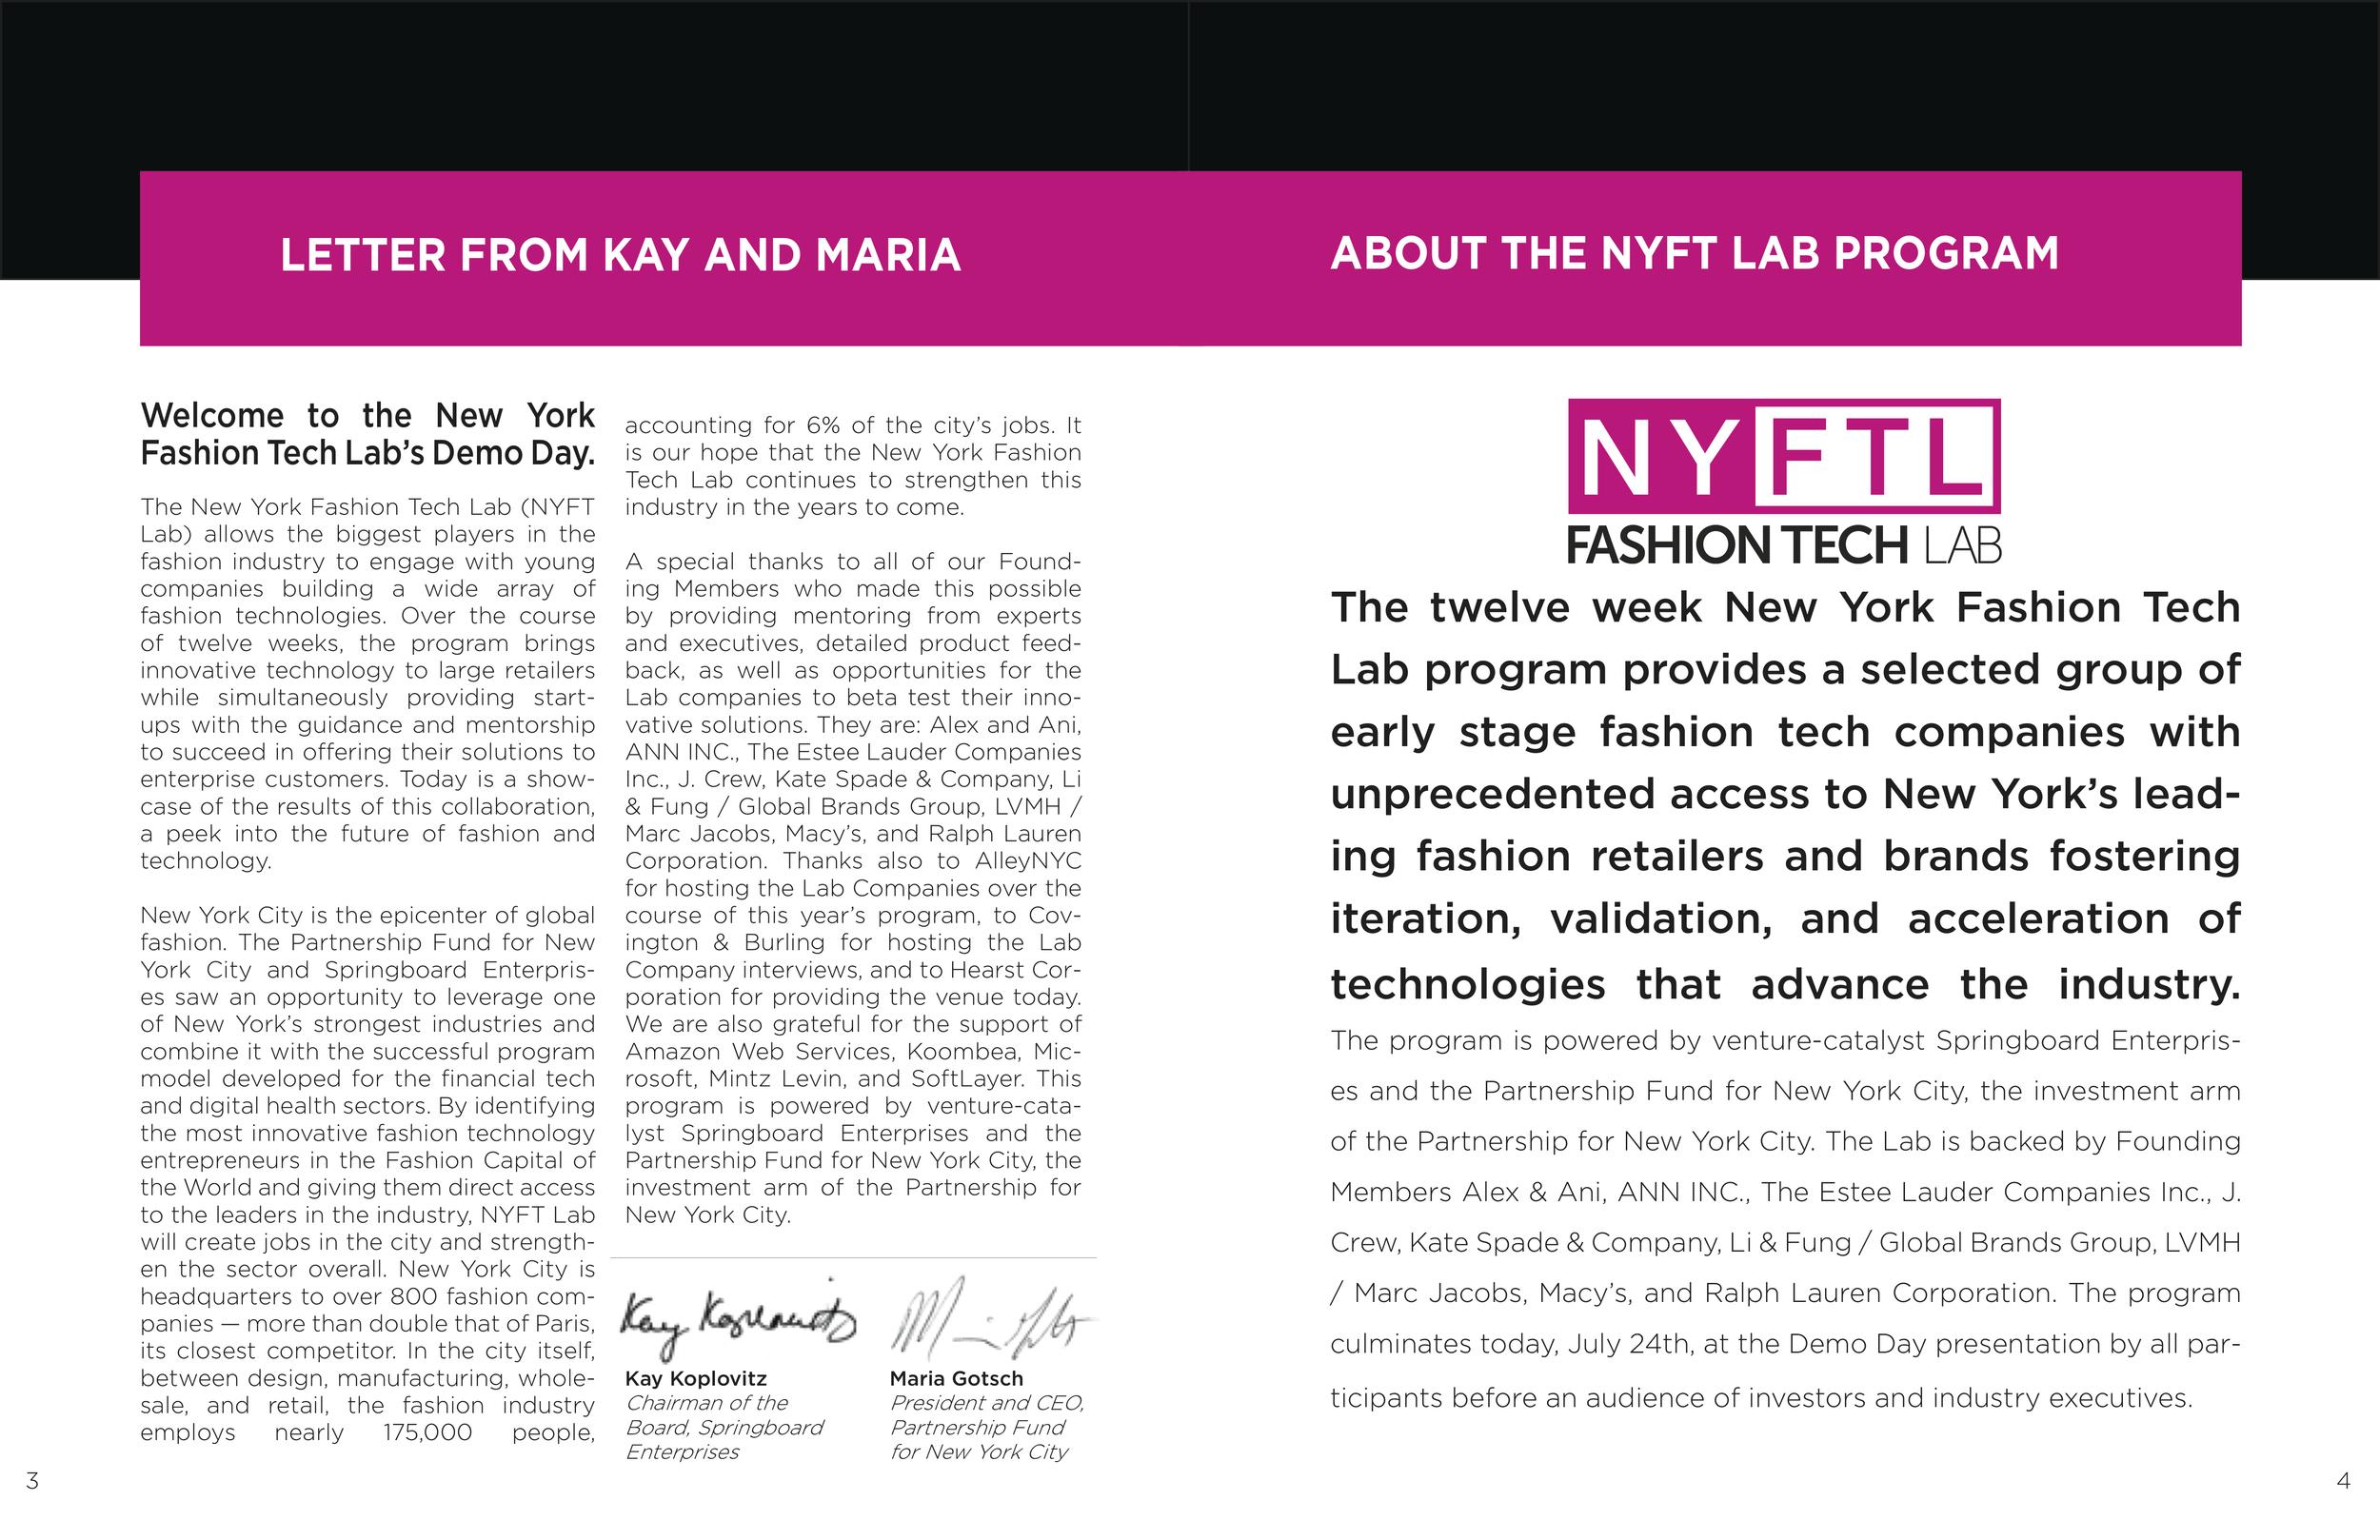 NYFT Lab Program page 4.jpg